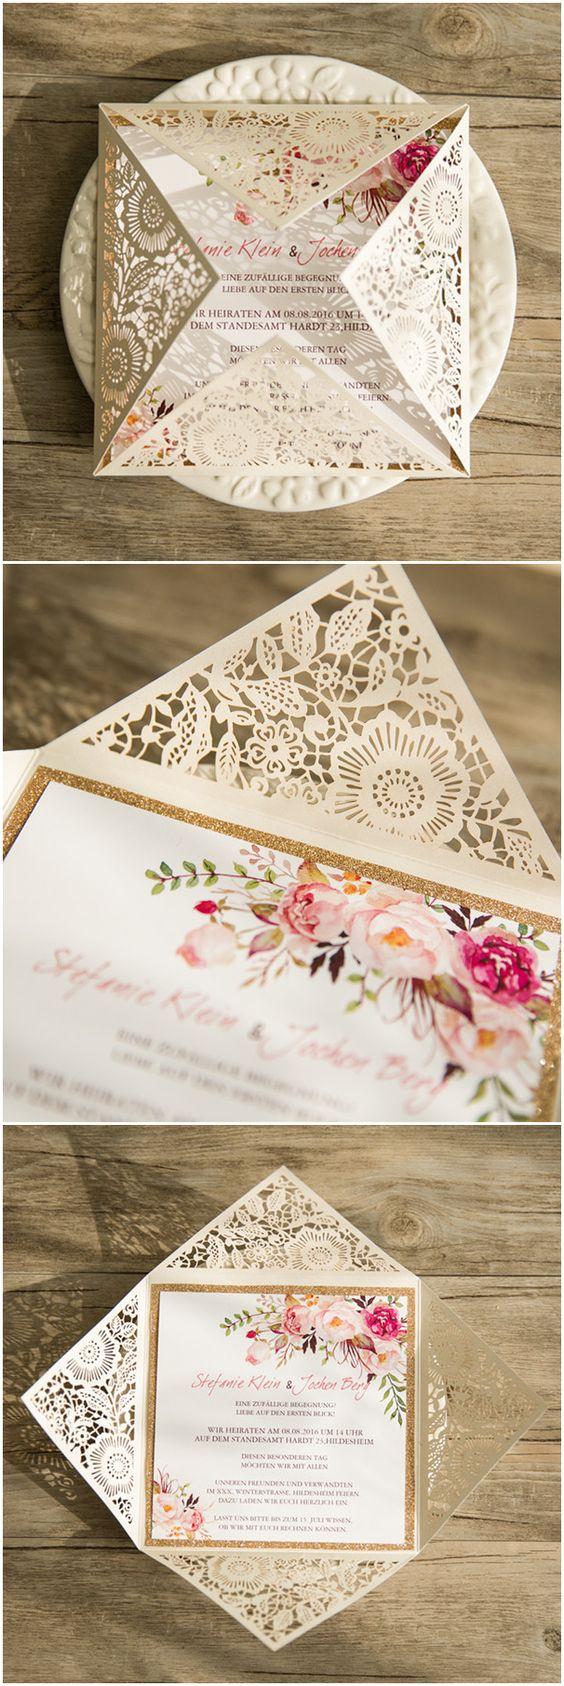 Bohemian rustic spring flower glittery gold laser cut invitations.